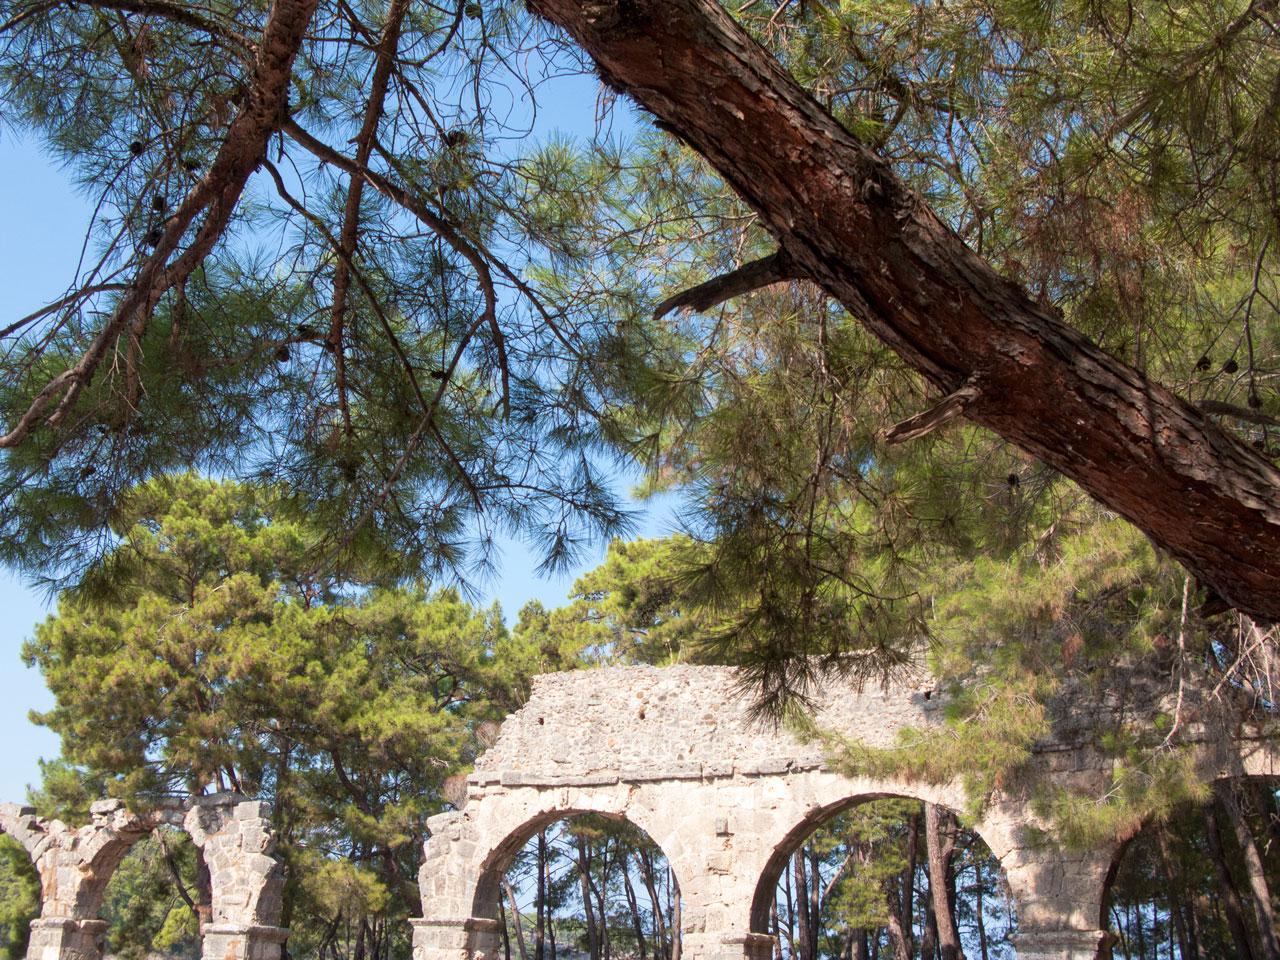 Turkey Phaselis roman ruins at seaside